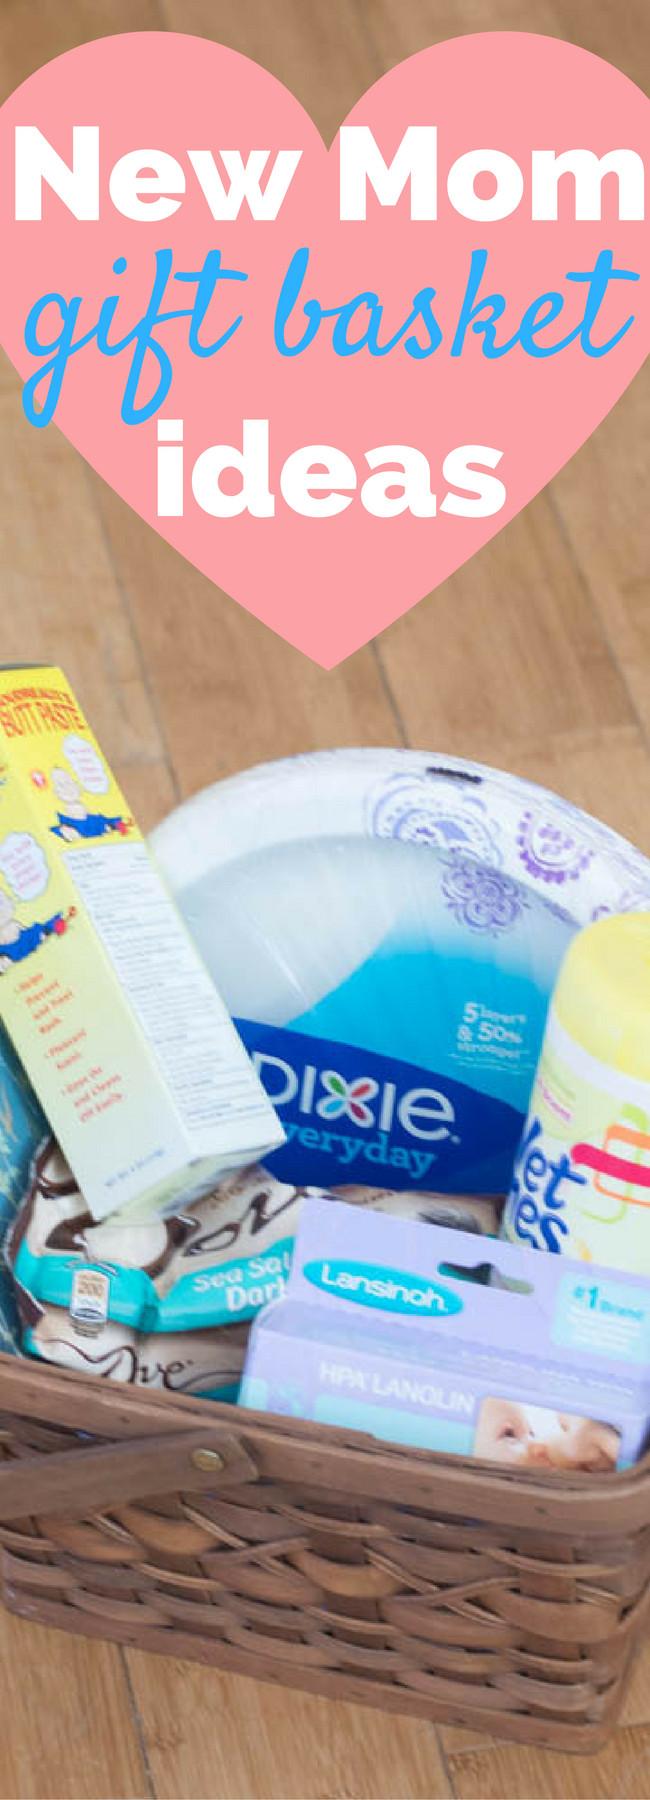 Gift Basket Ideas For New Mom  New Mom Gift Basket Ideas